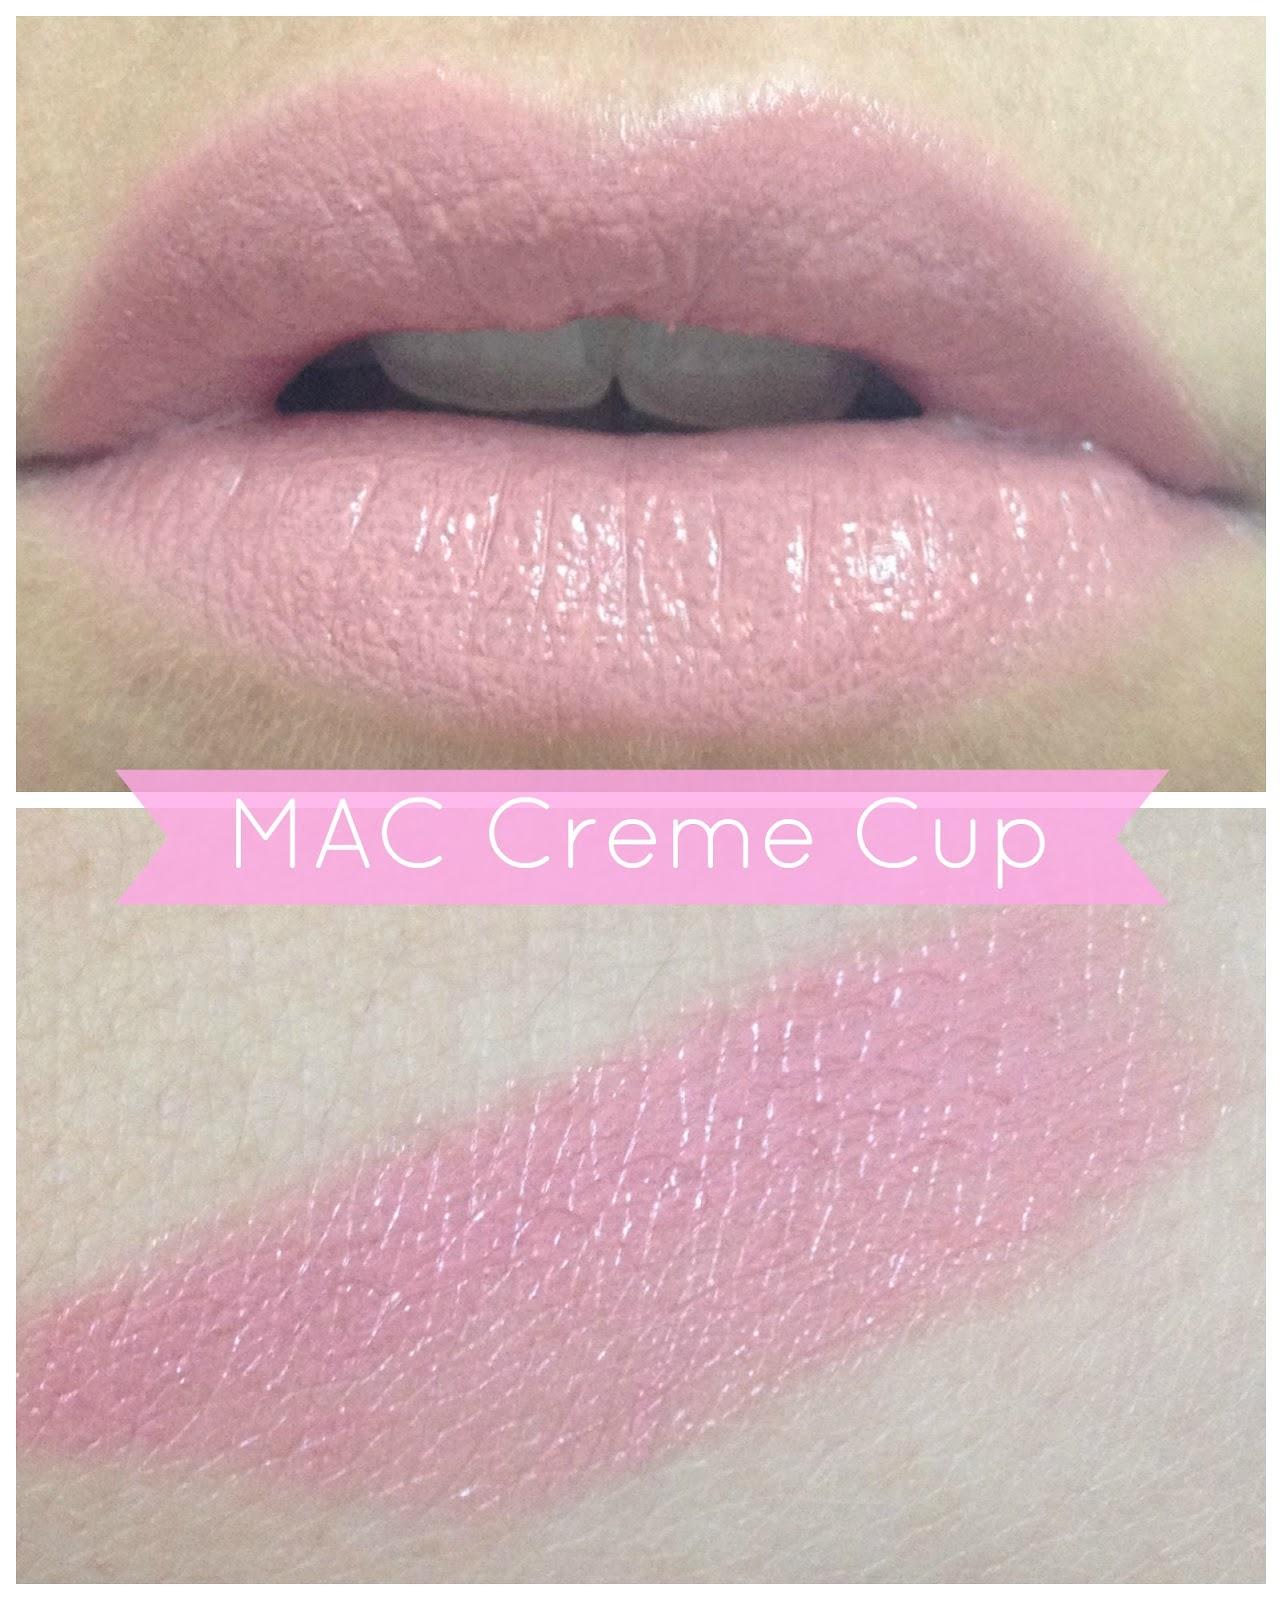 Mac Creme Cup Lipstick Uk   The Art Of Beauty